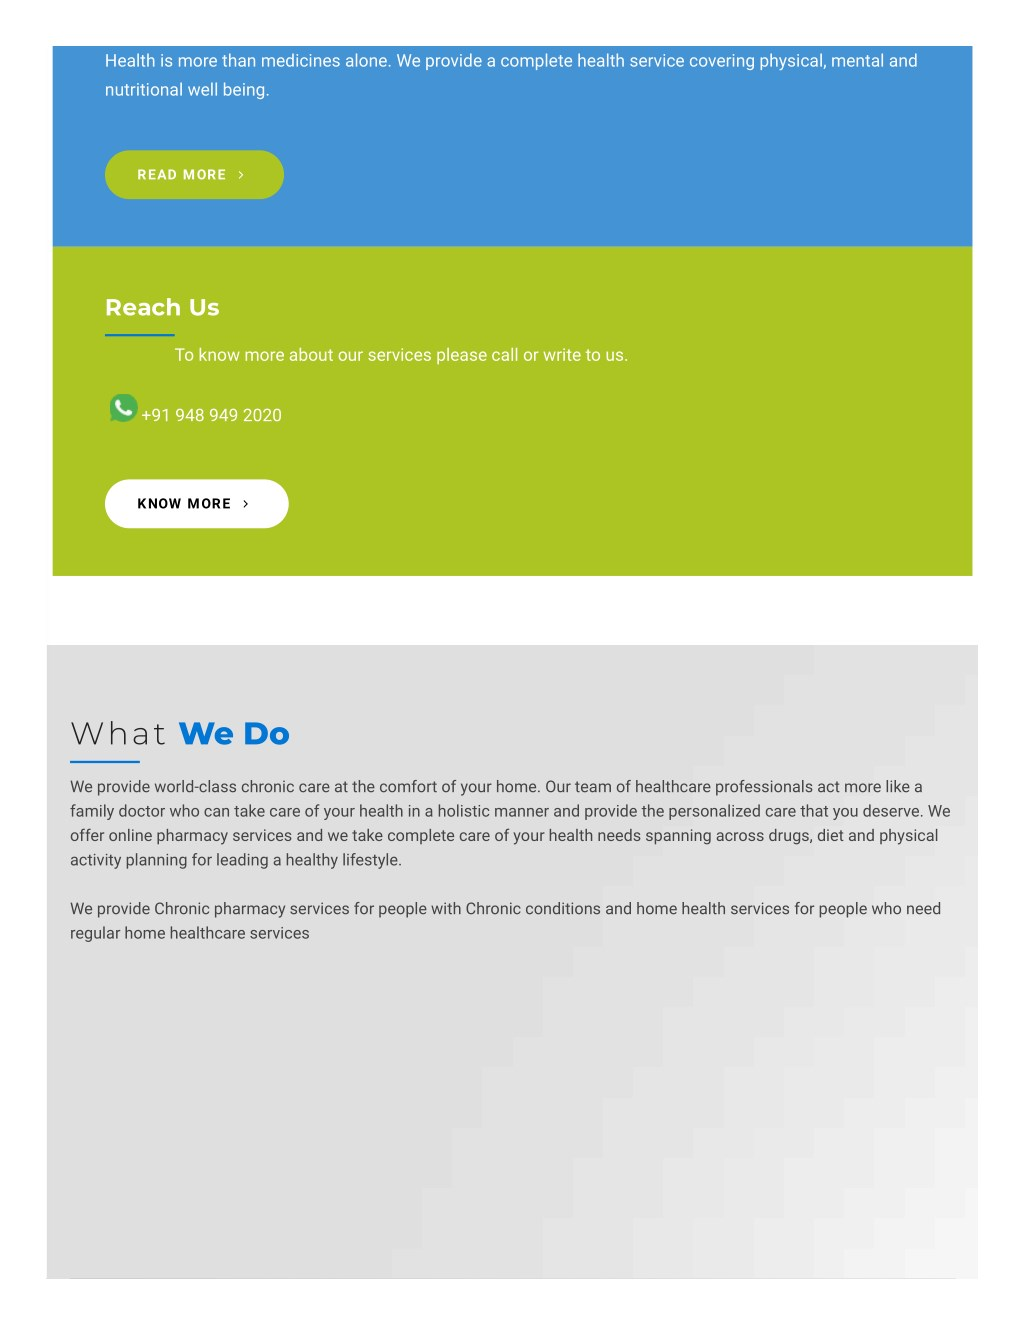 PPT - Patohealth-Online Pharmacy Chennai | Buy Online